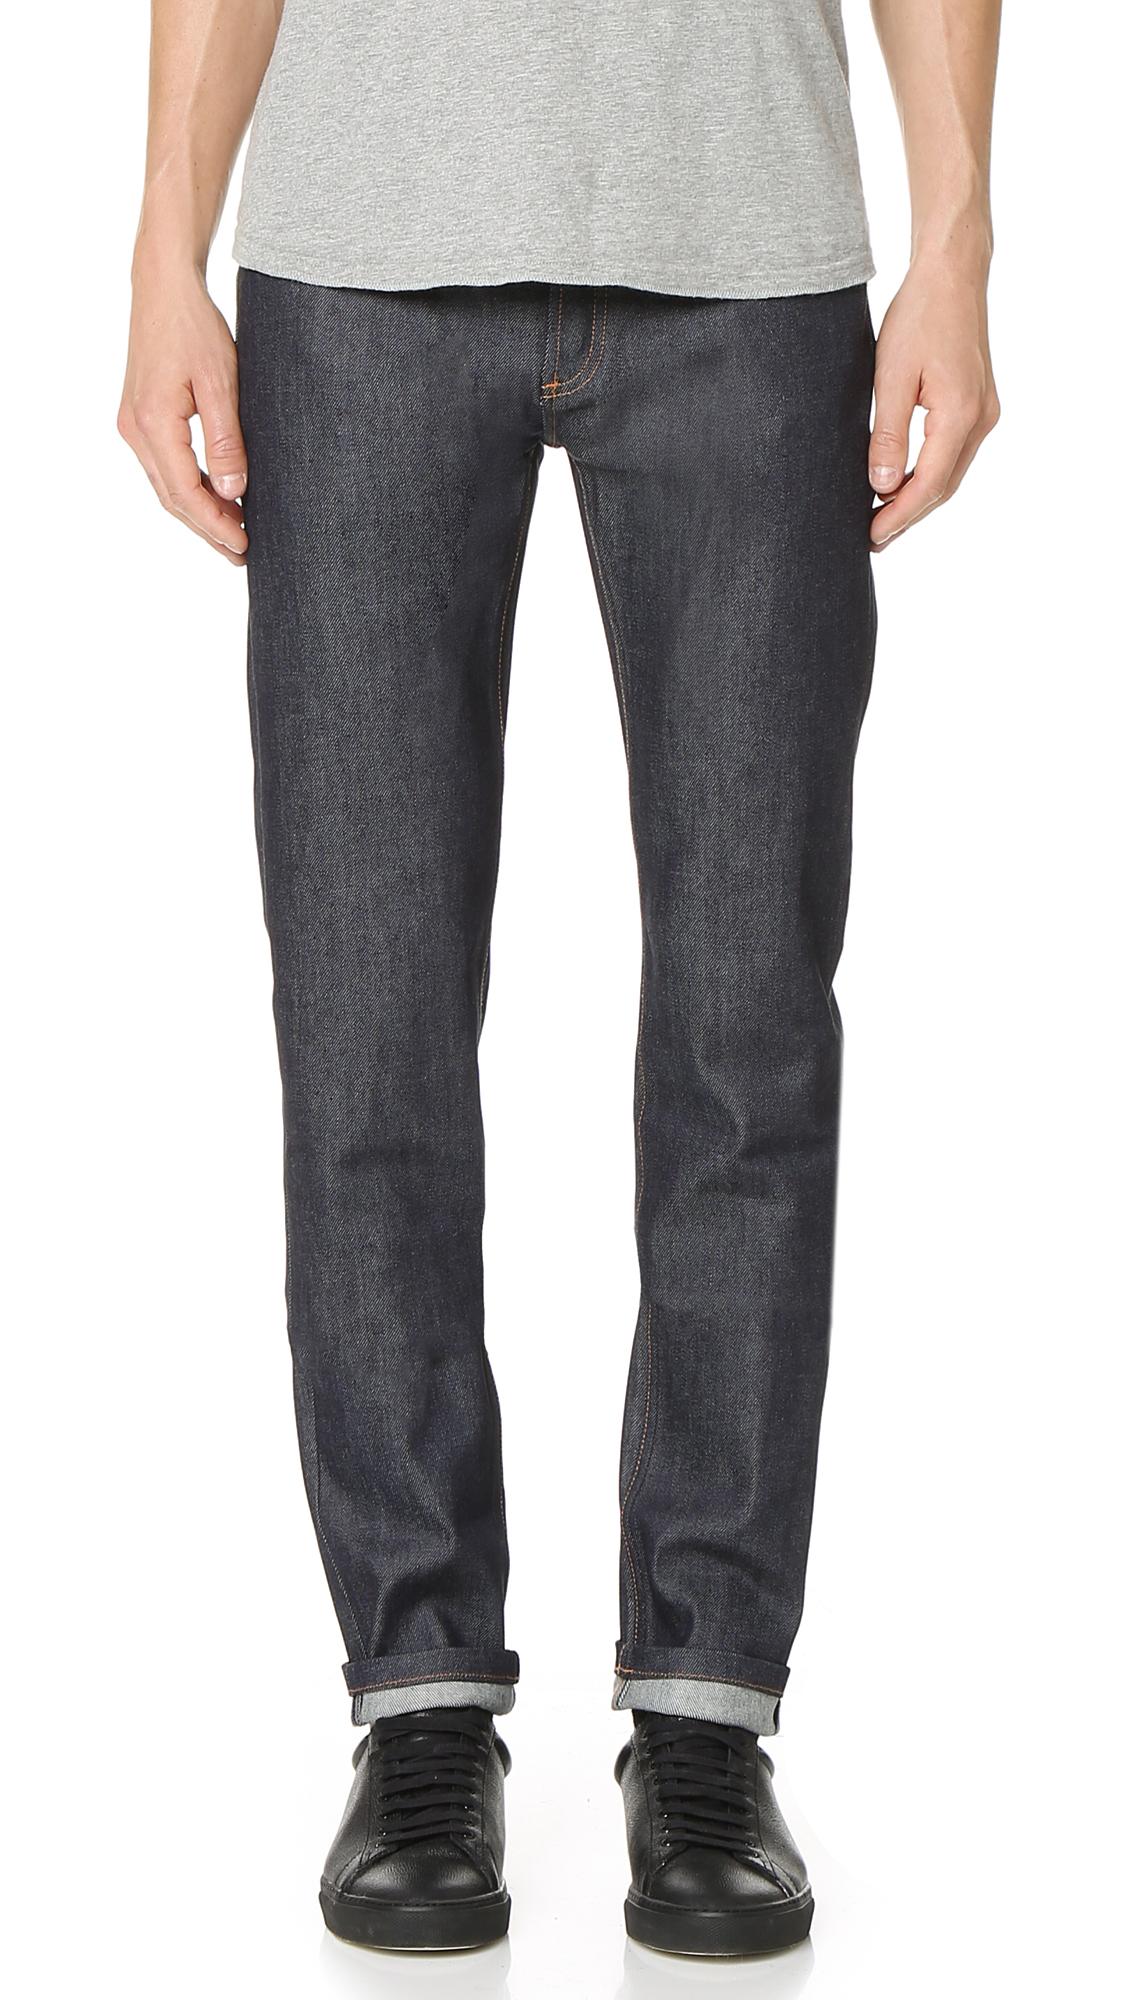 Petit Standard Brut Stretch Jeans